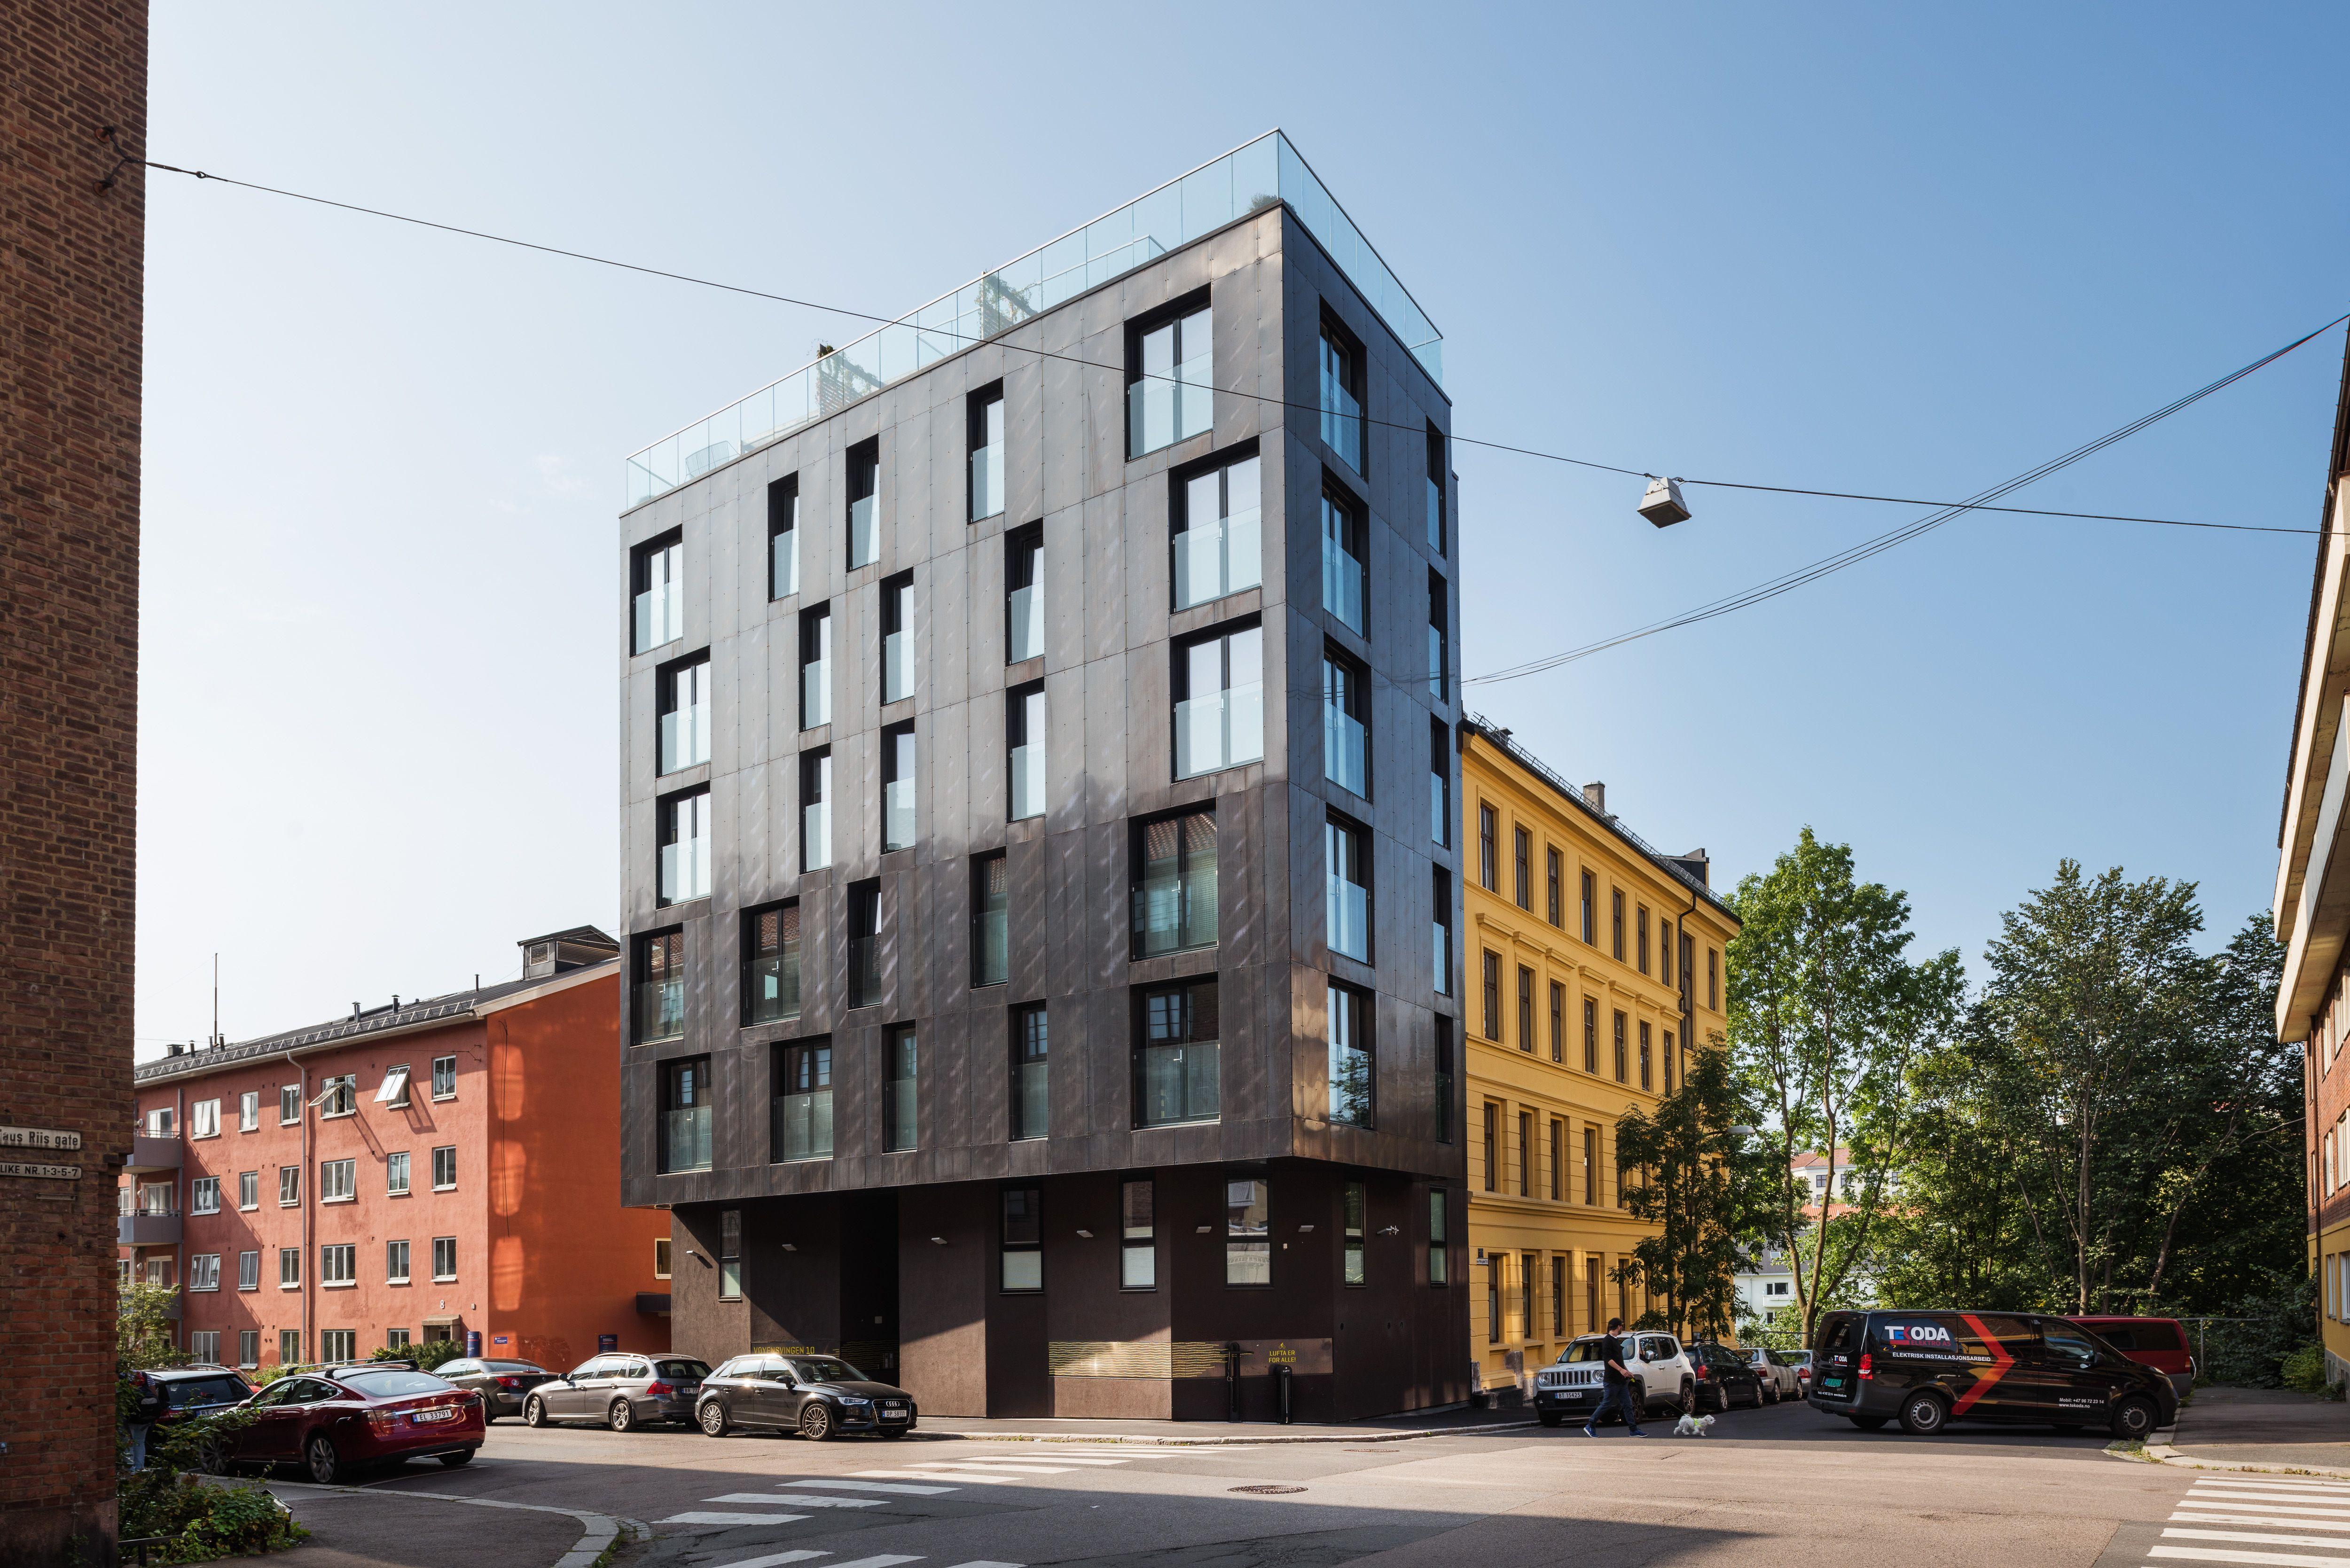 Vøyensvingen 10 // Reiulf Ramstad Arkitekter